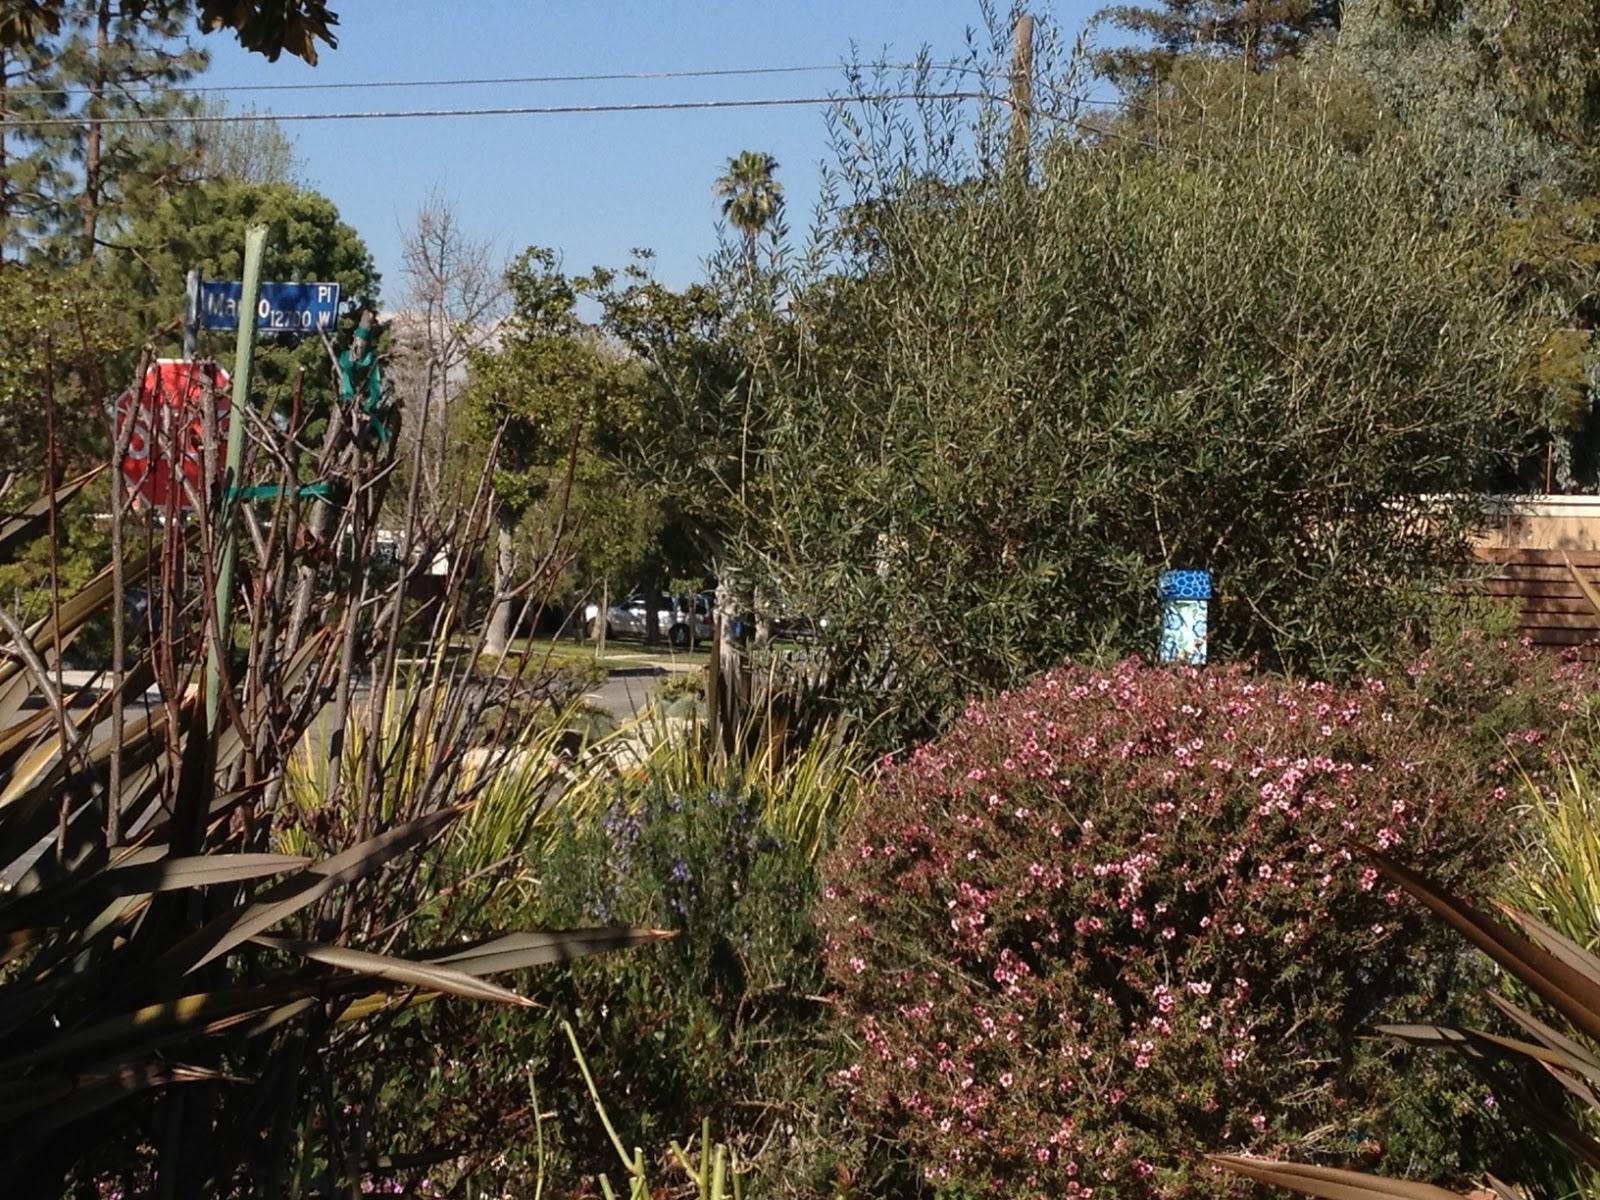 2018 Mar Vista Green Garden Showcase: 3600 Meier Street